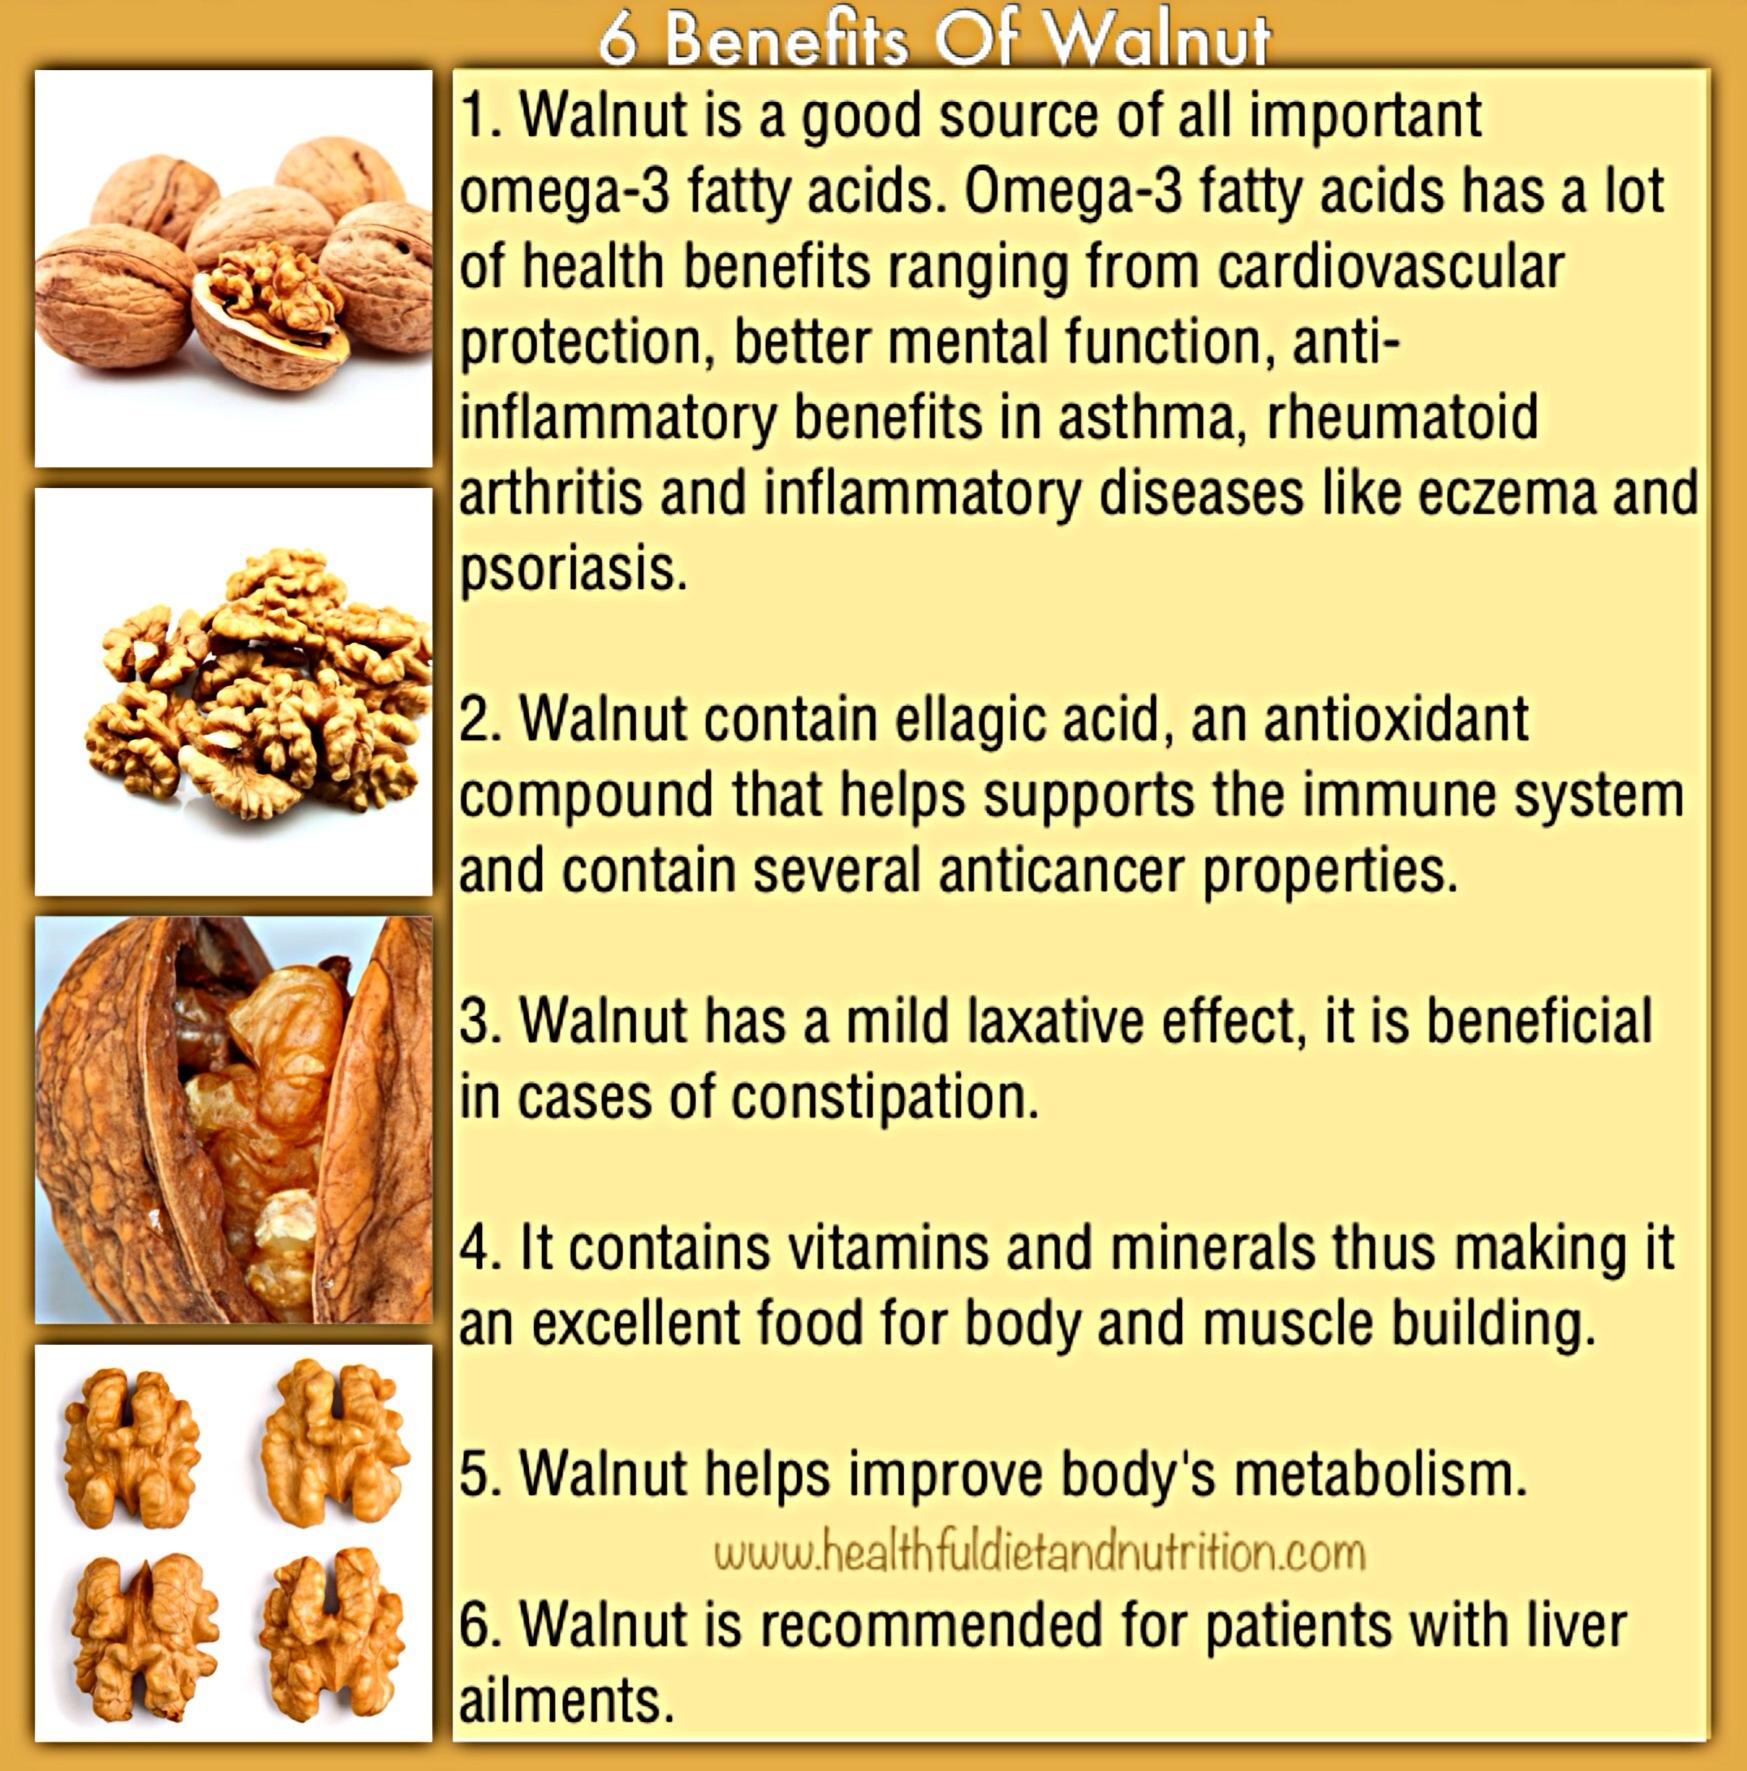 6 Benefits of Walnut